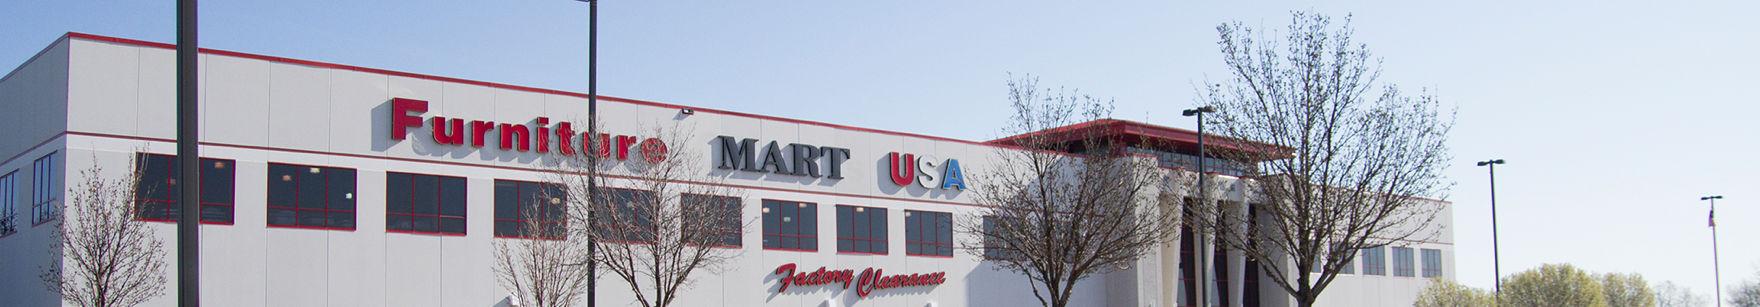 Career Furniture Mart Usa, Furniture Mart Burlington Iowa